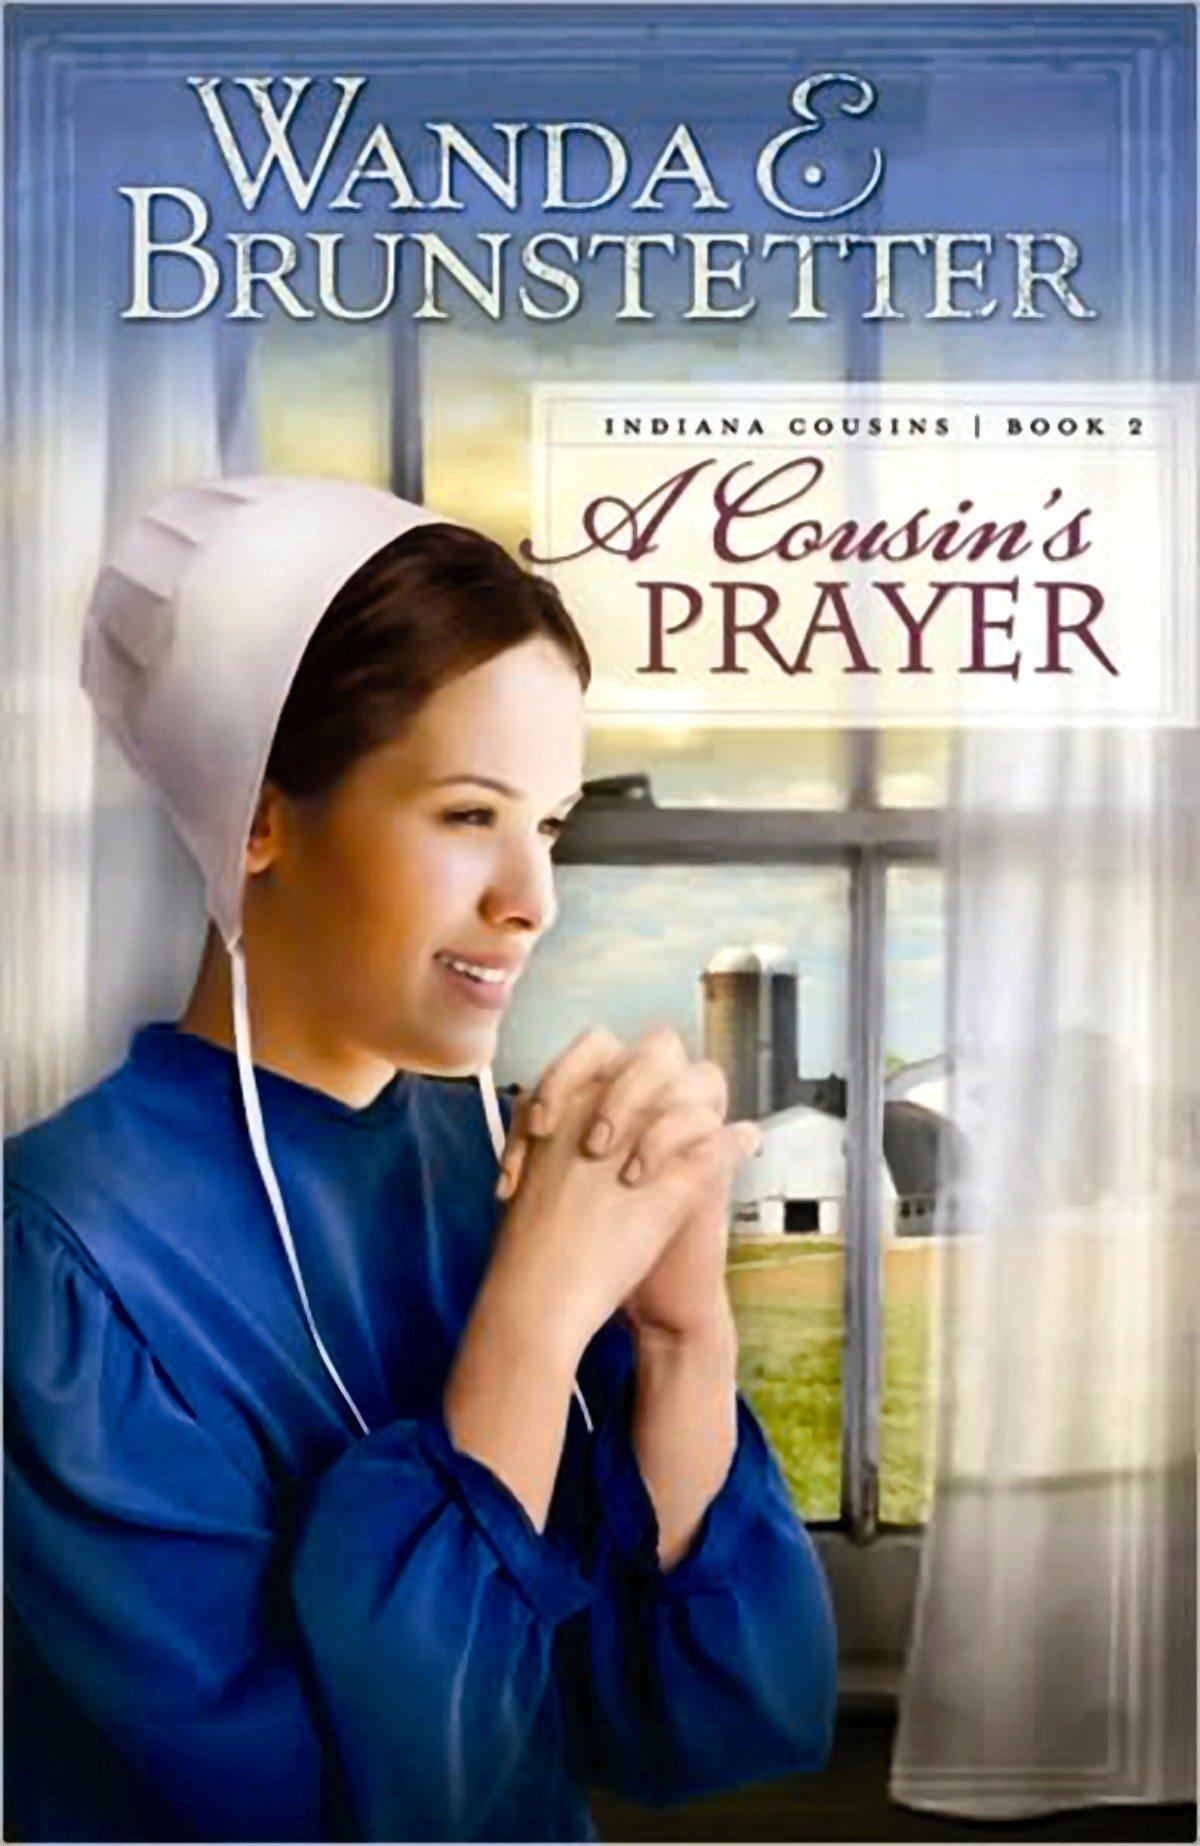 A Cousin's Prayer (Indiana Cousin's): Wanda E. Brunstetter: 9781602856004:  Amazon.com: Books